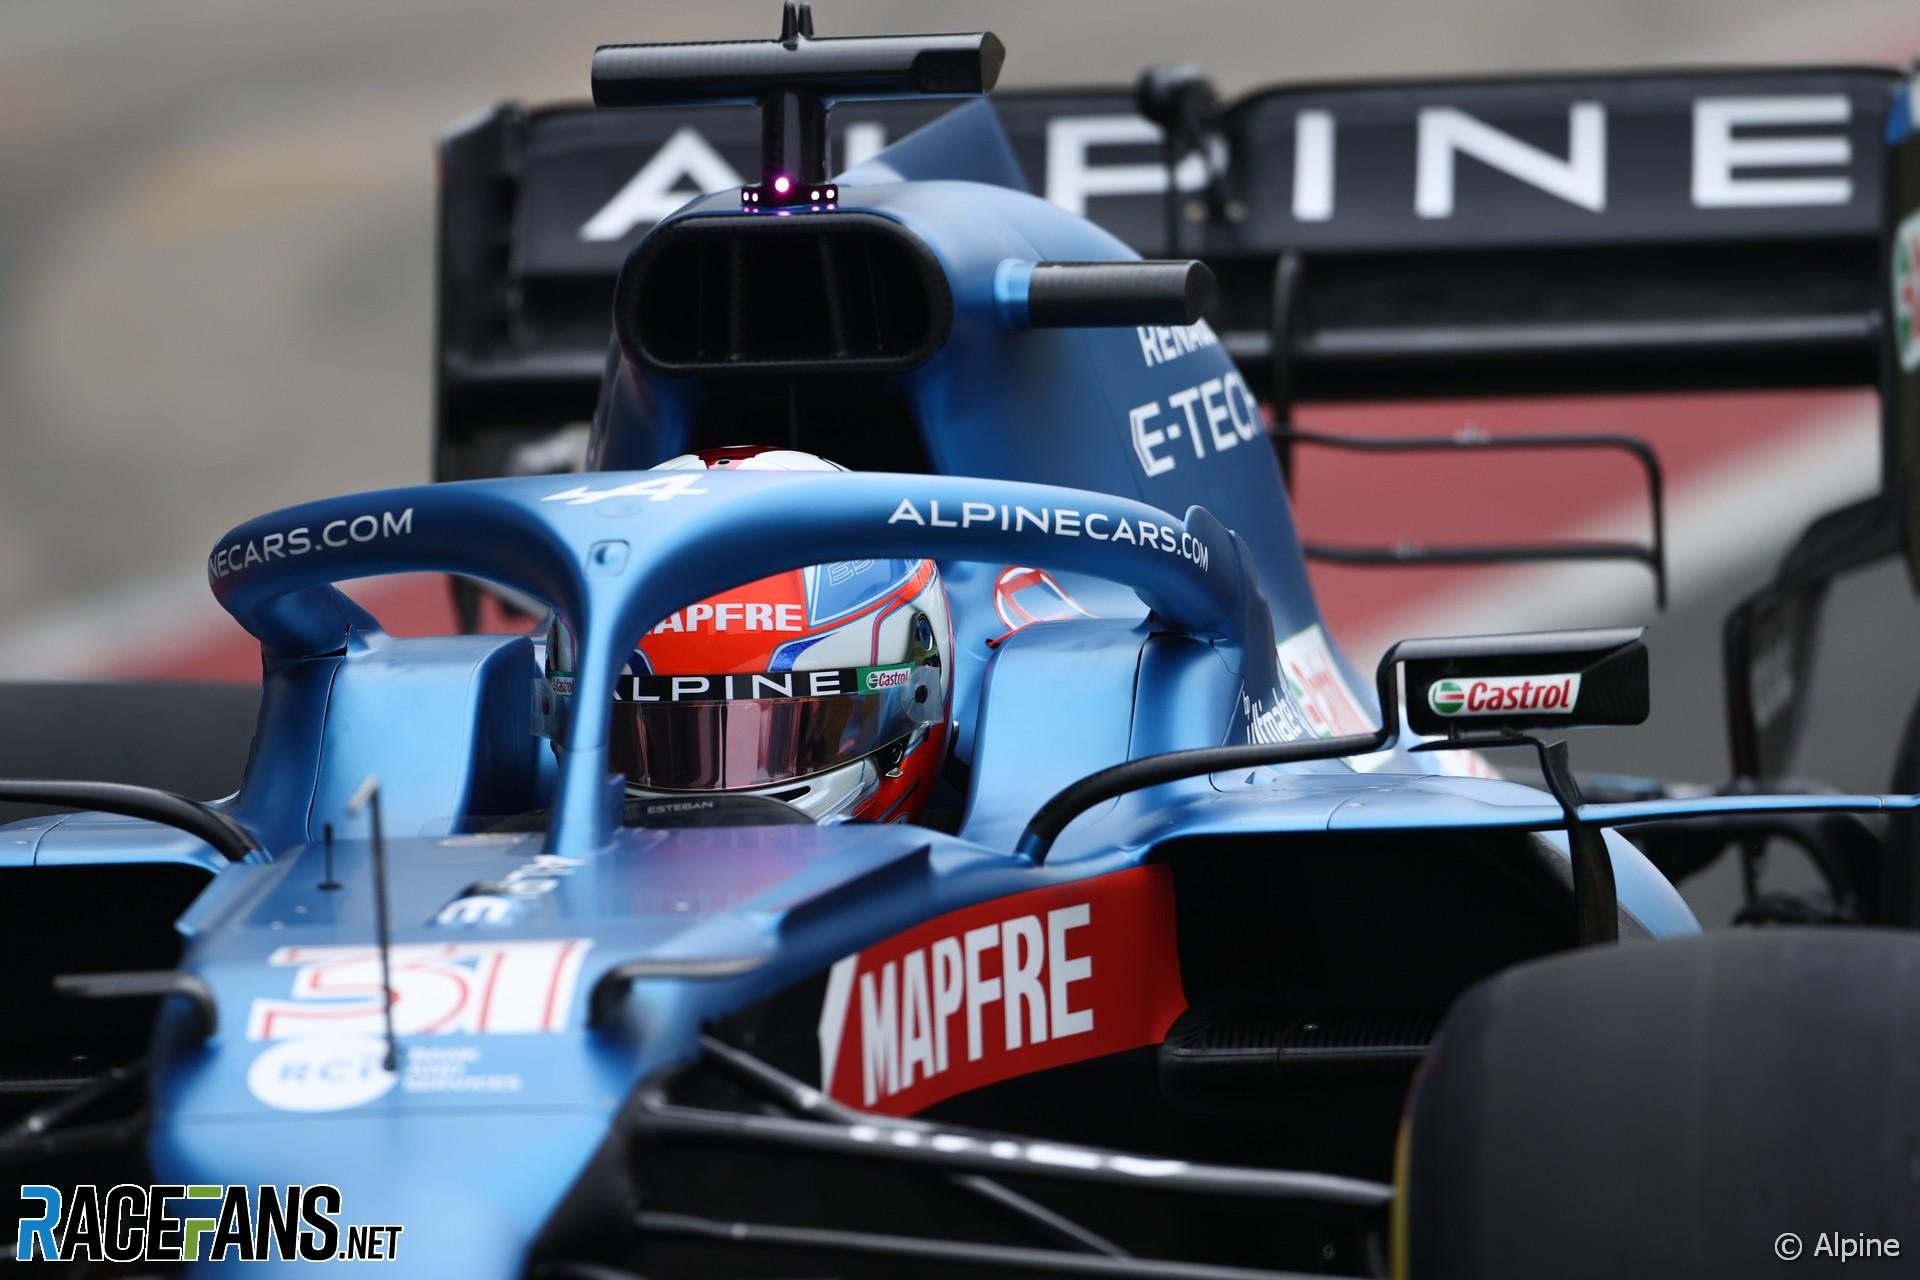 Esteban Ocon, Alpine, Silverstone, 2021